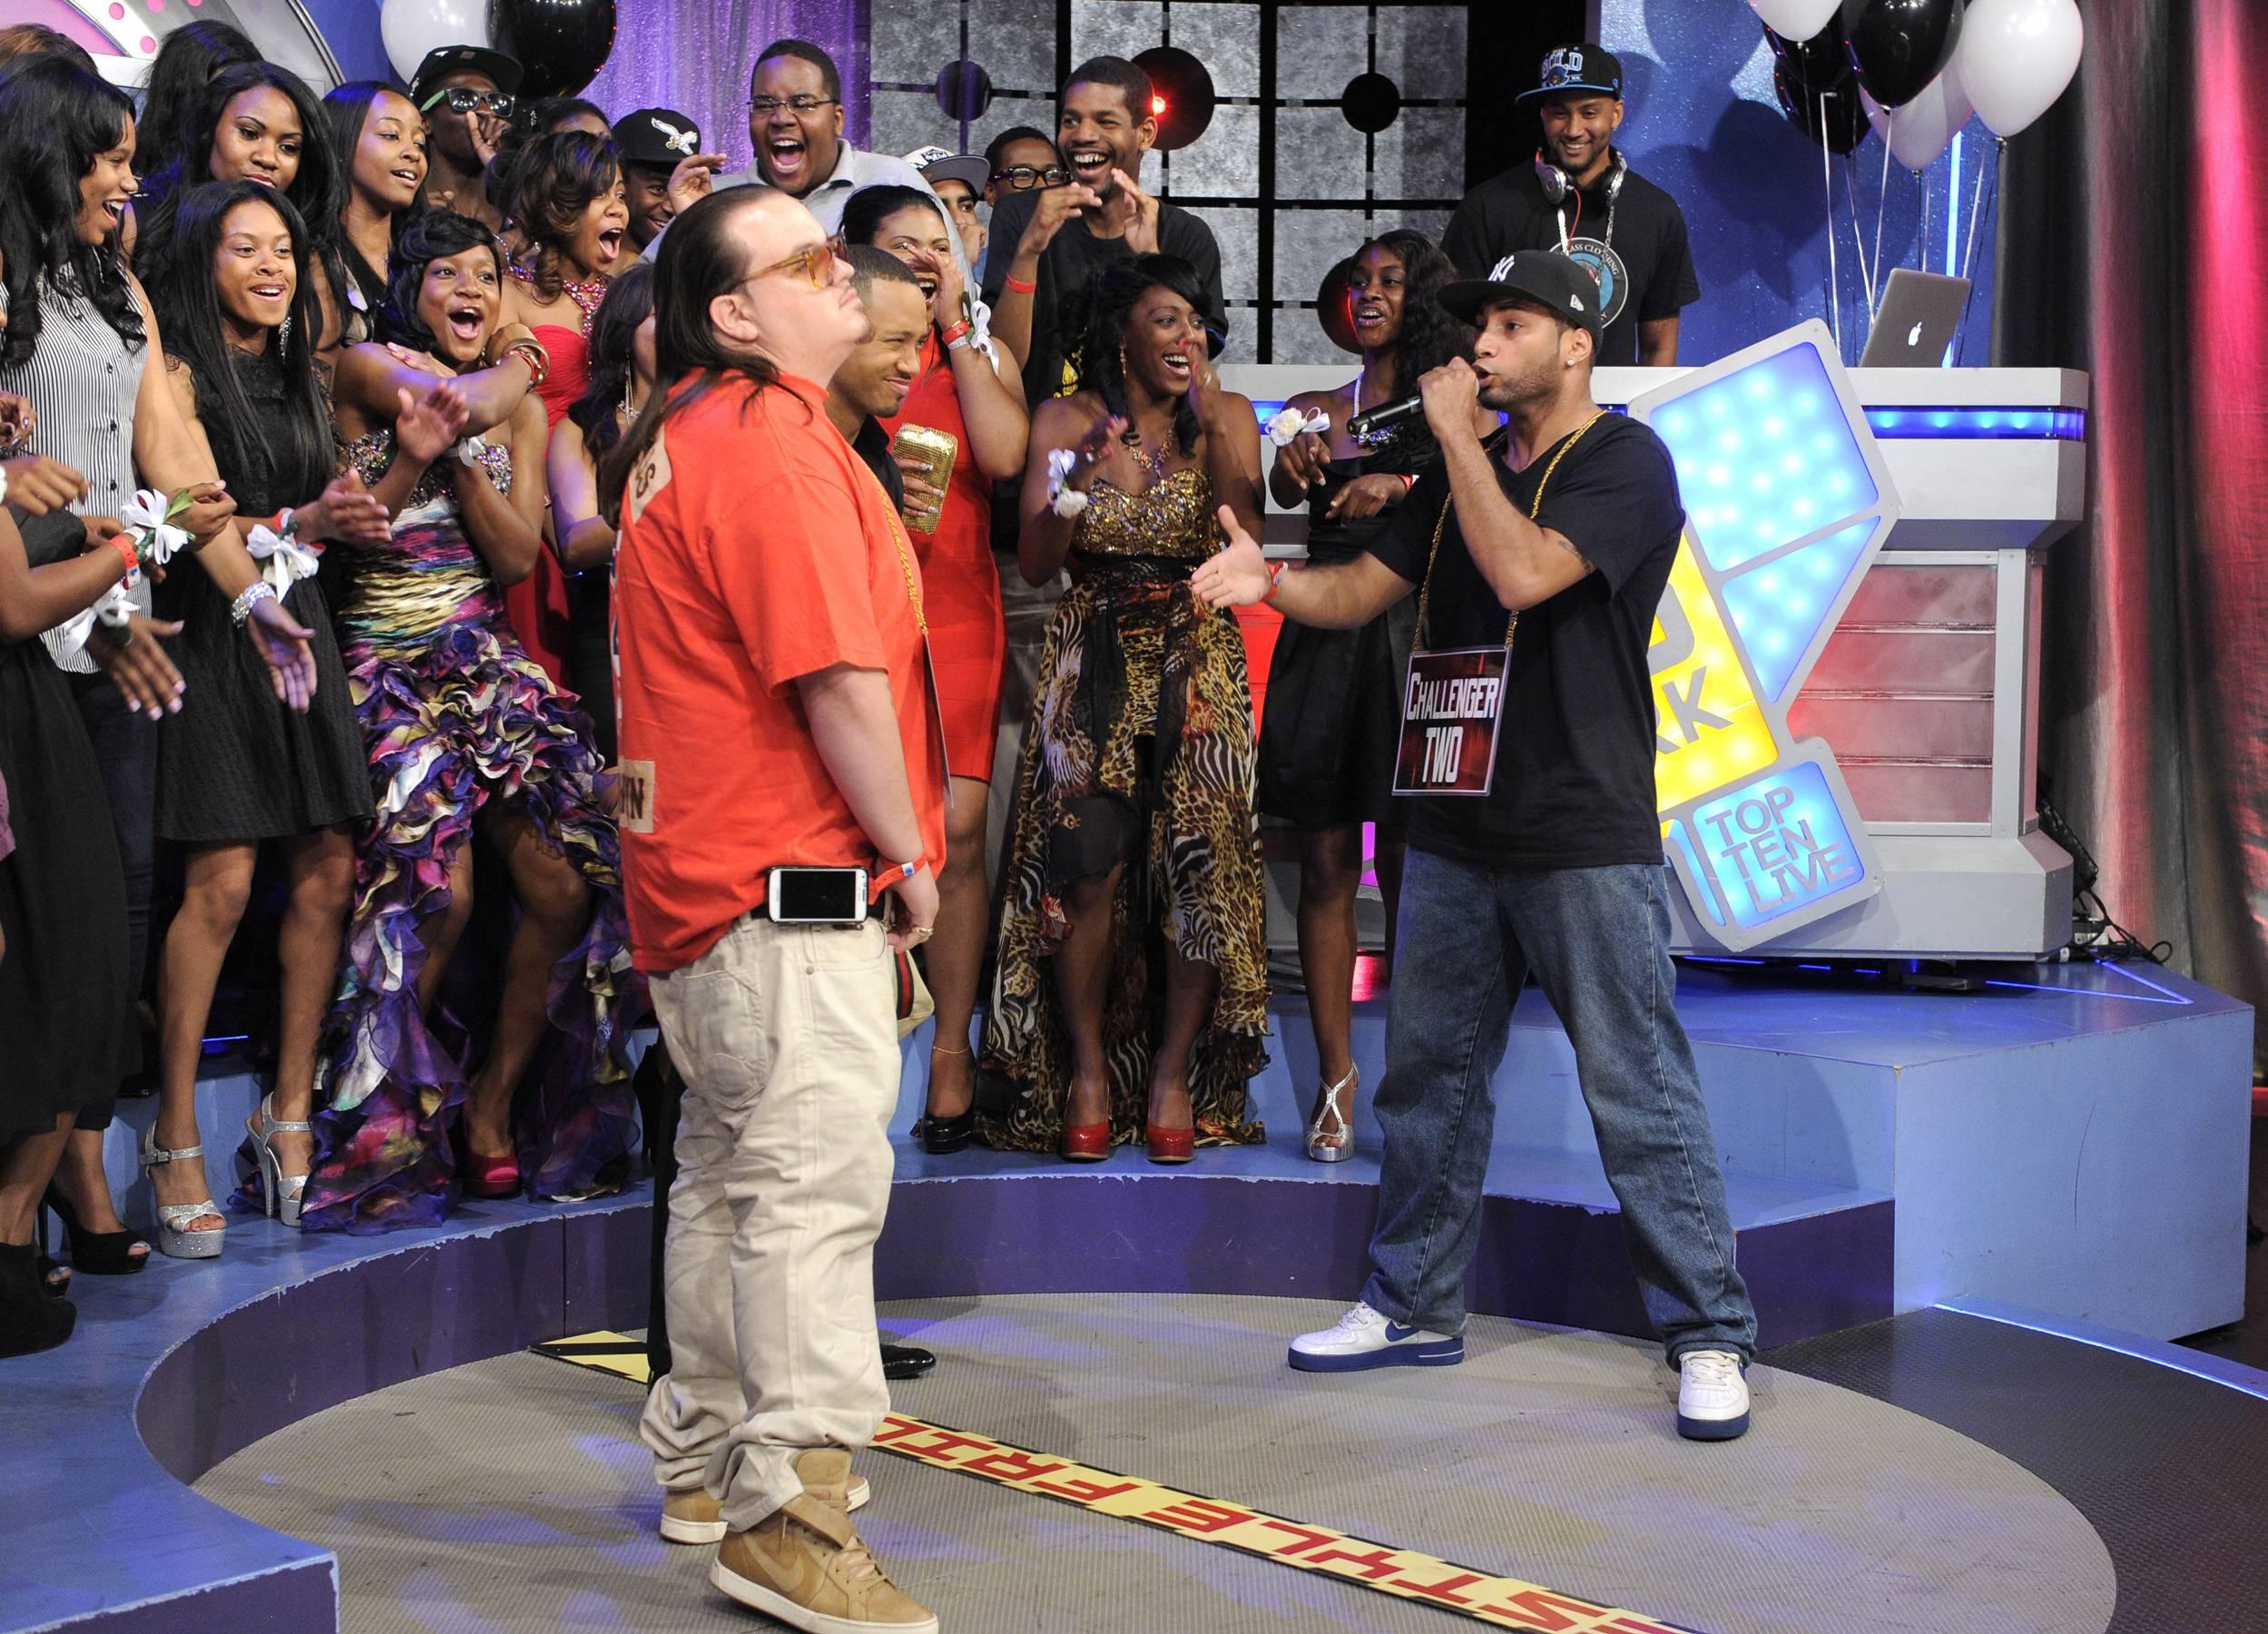 Jayo Slays The Beat - Freestyle Friday contestants Interstate Fatz and Jayo the Beatslayer at 106 & Park, May 25, 2012. (Photo: John Ricard / BET)